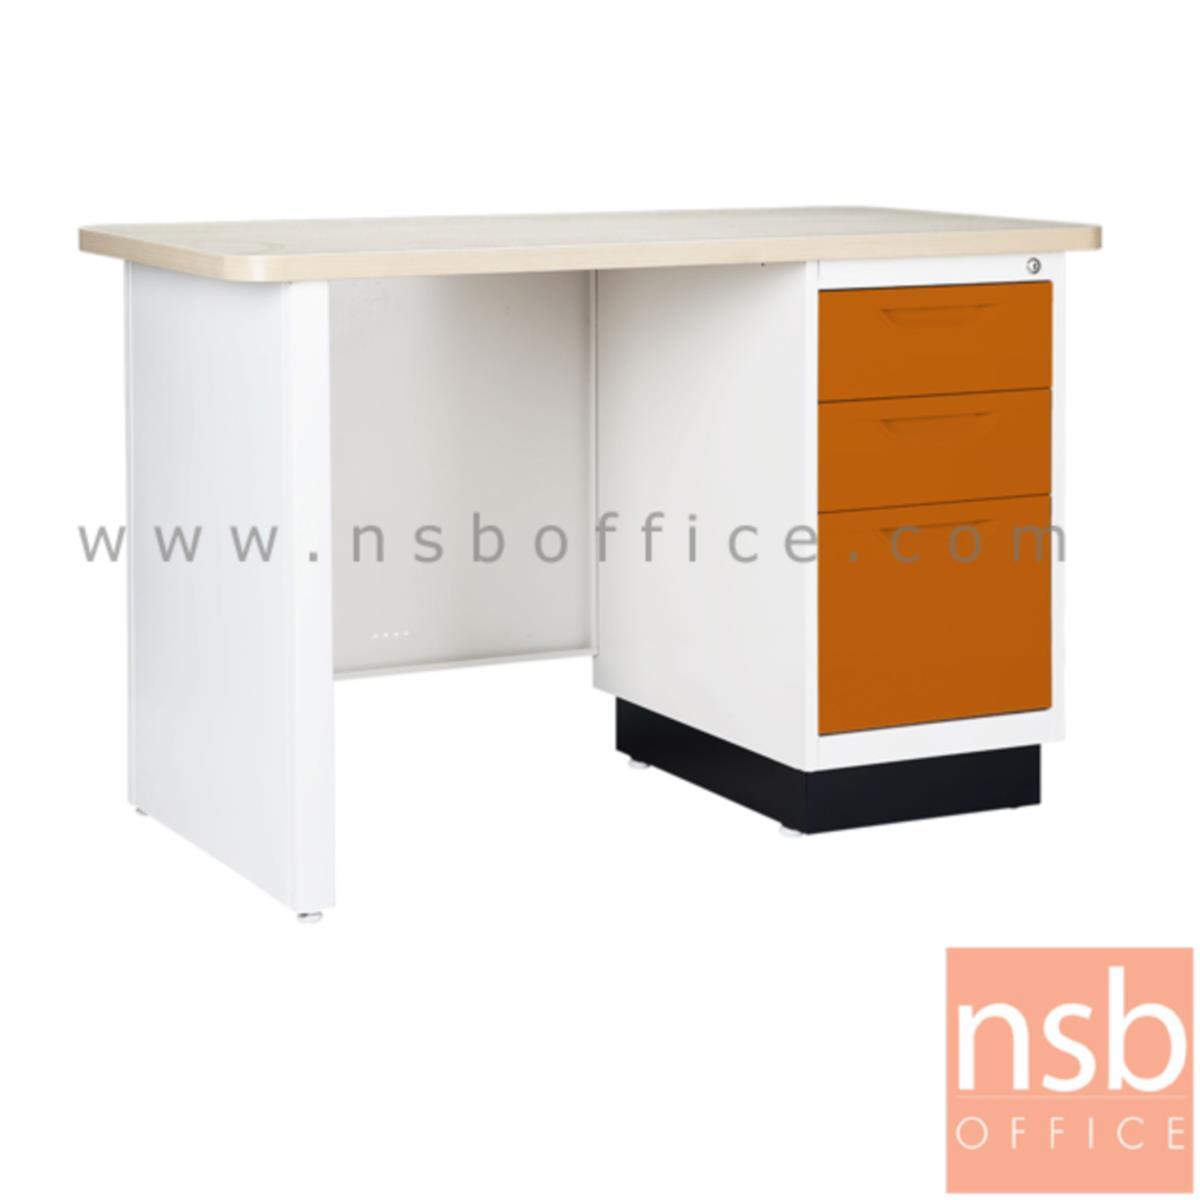 E22A003:โต๊ะทำงานหน้า Melamine ลายไม้ 3 ลิ้นชัก รุ่น BS-123 ขนาด 4 ฟุต 120W*75H cm. สีบีช